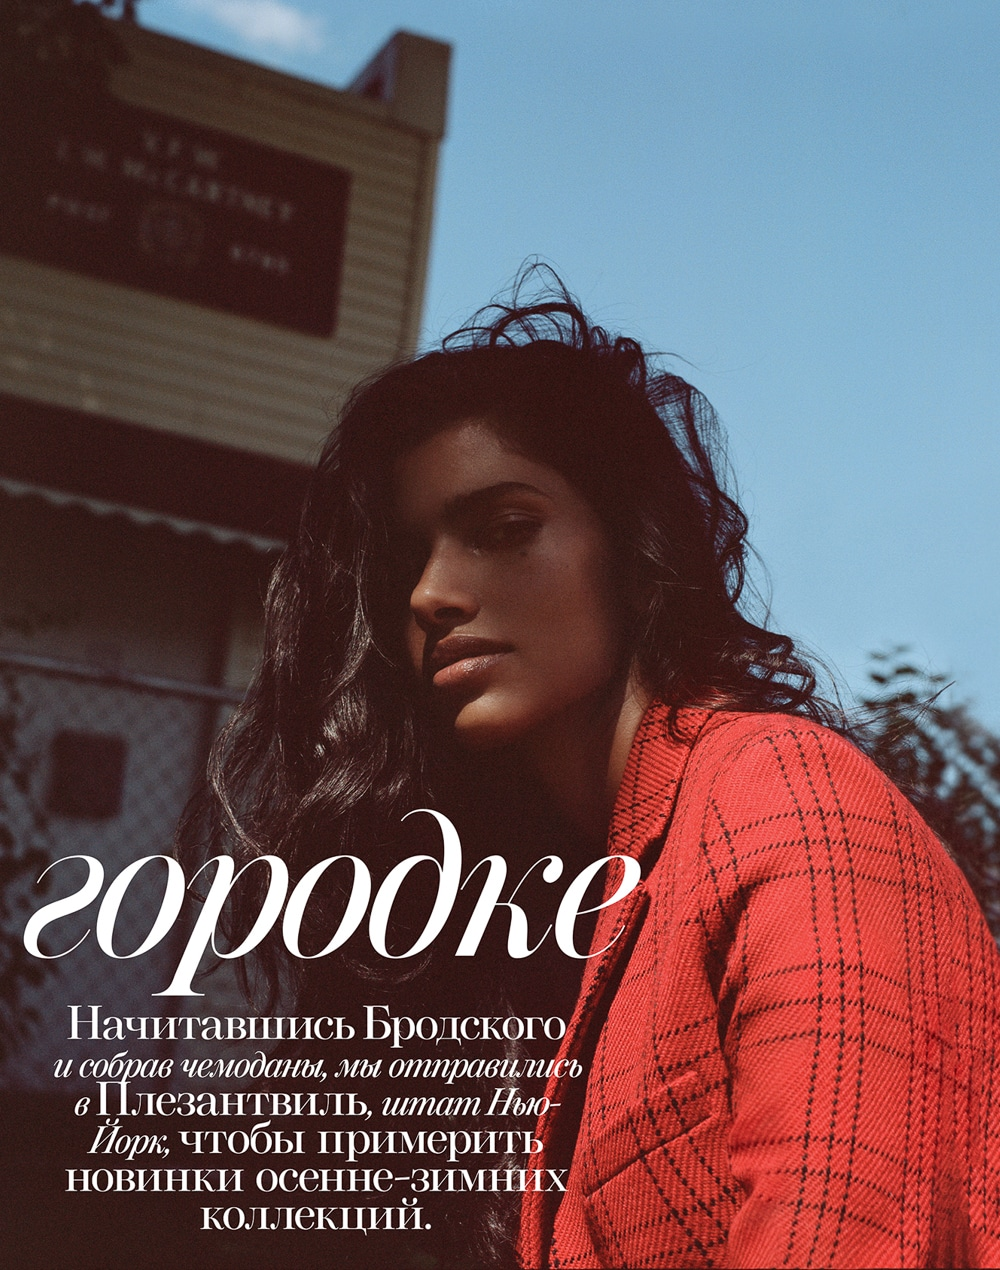 Vogue-Russia-Pooja-Mor-Buzz-White-2.jpg